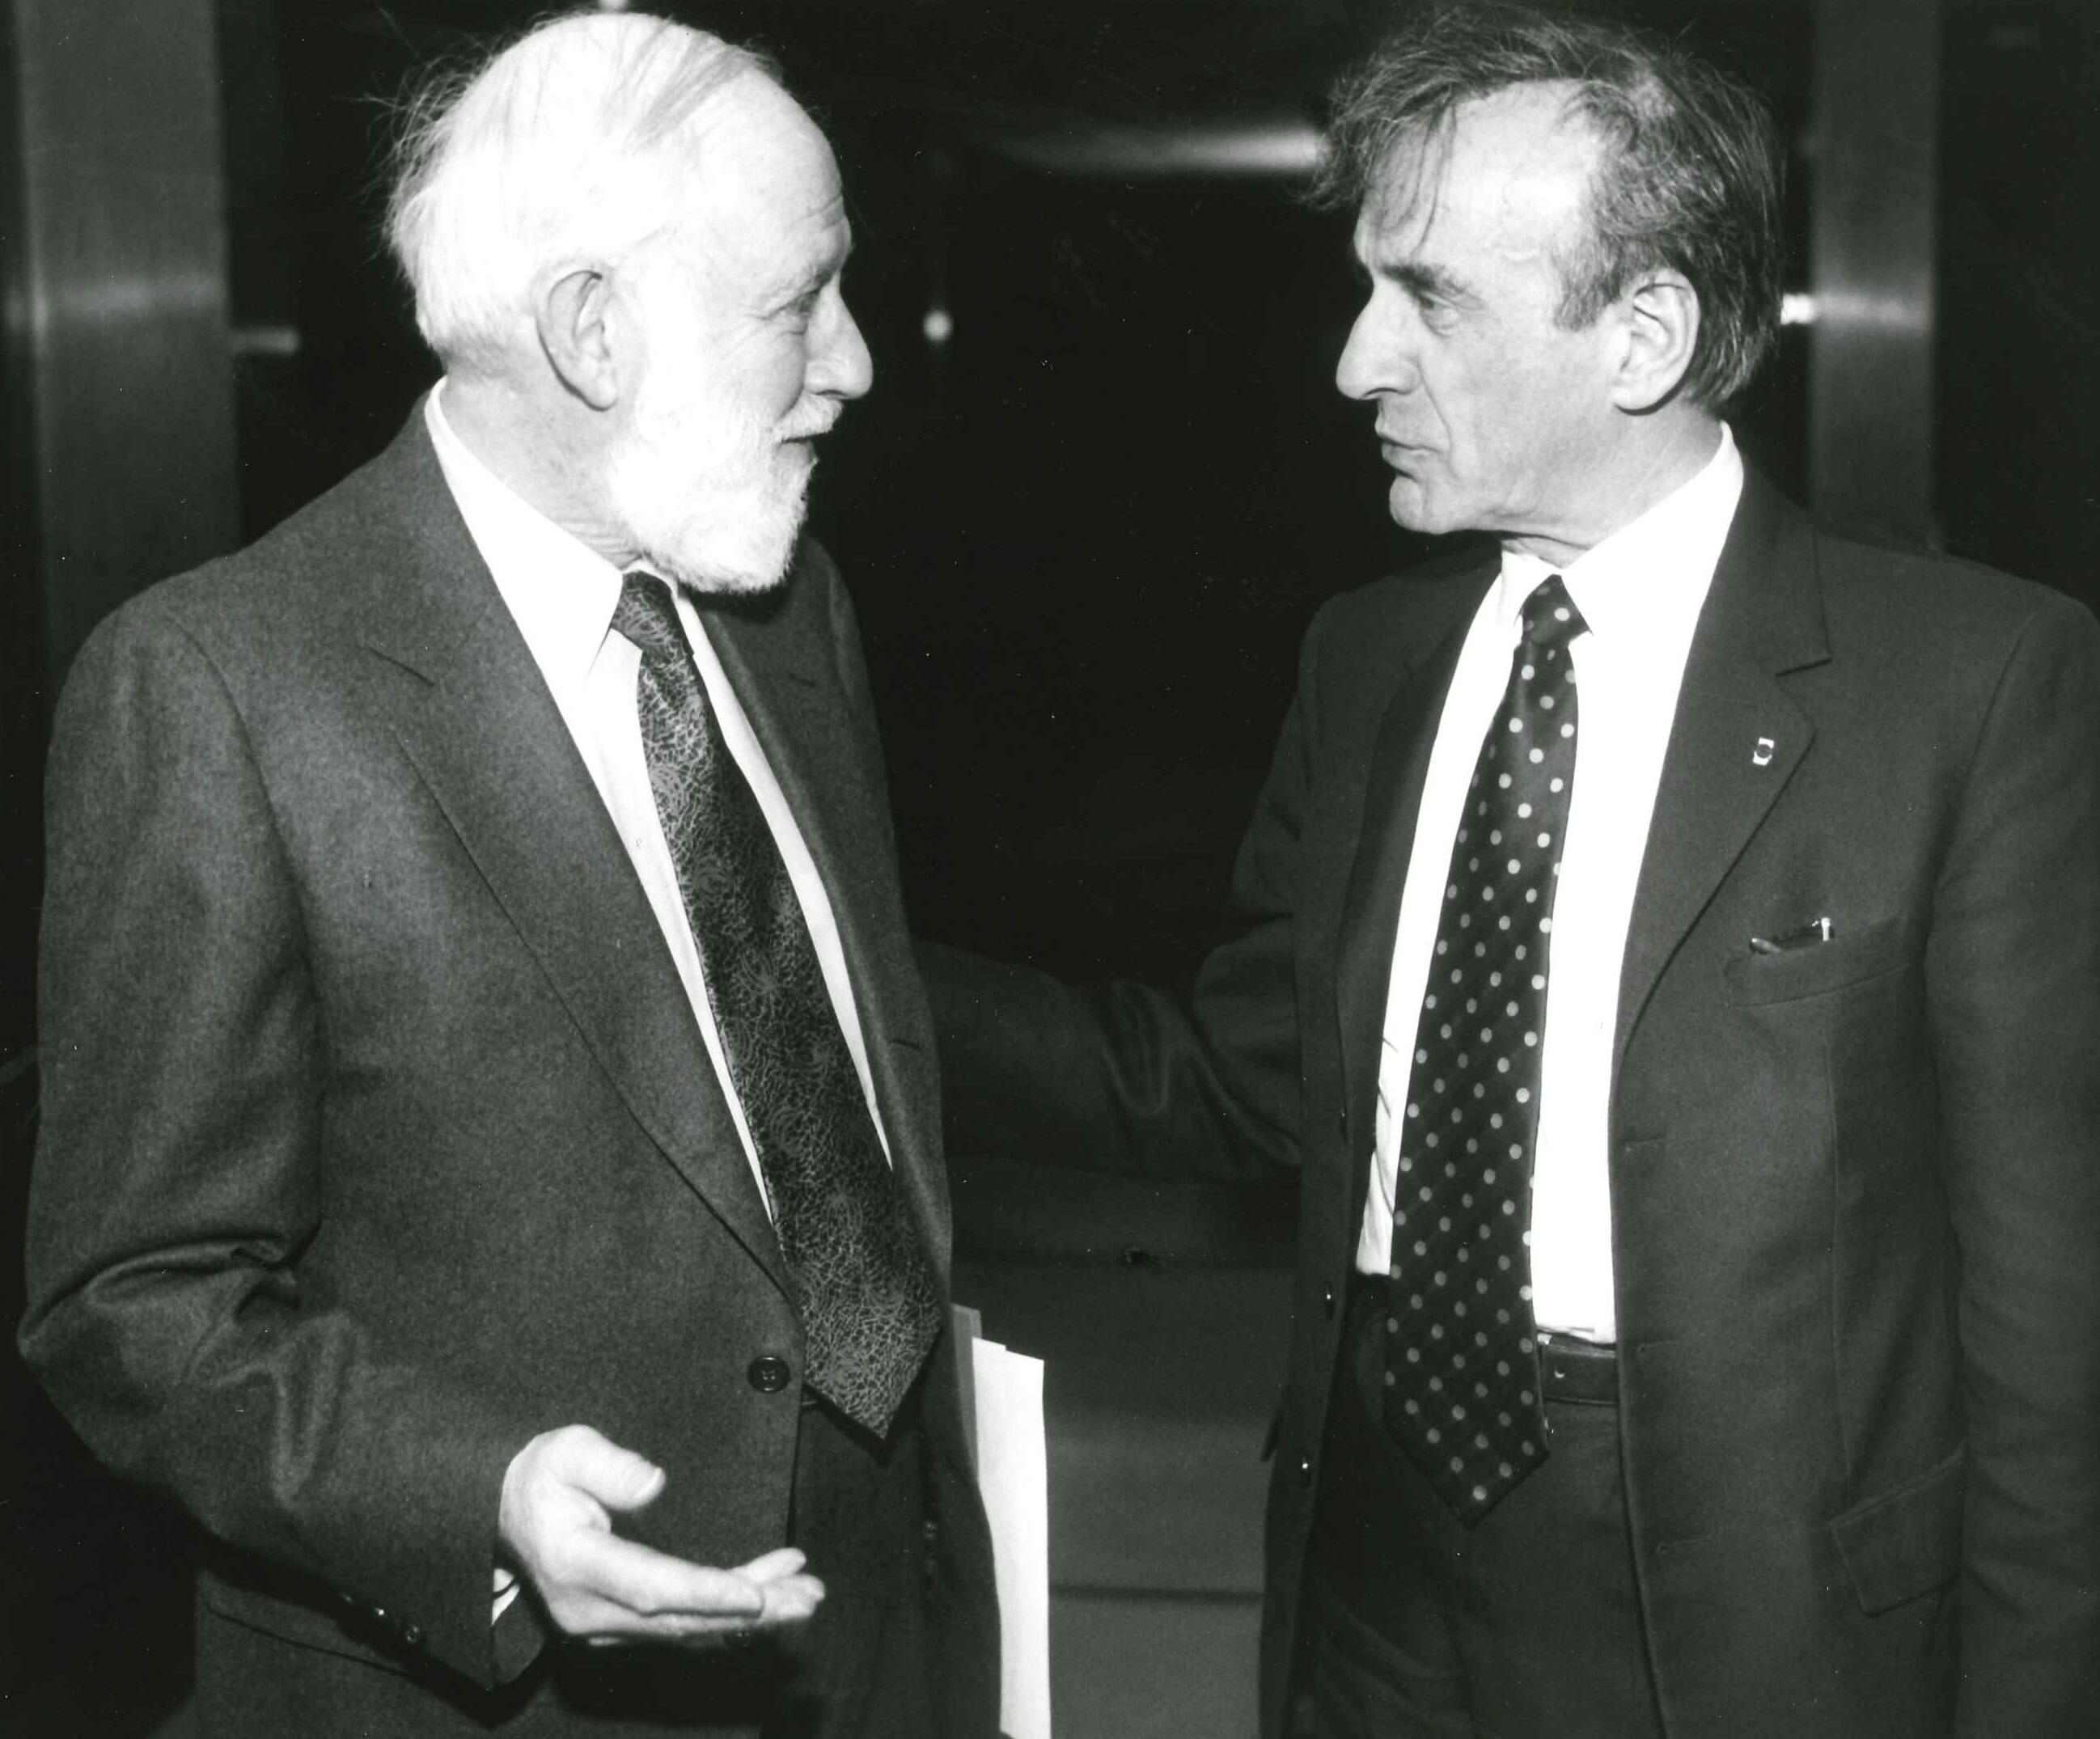 Professor Geoffrey Hartman and Elie Wiesel